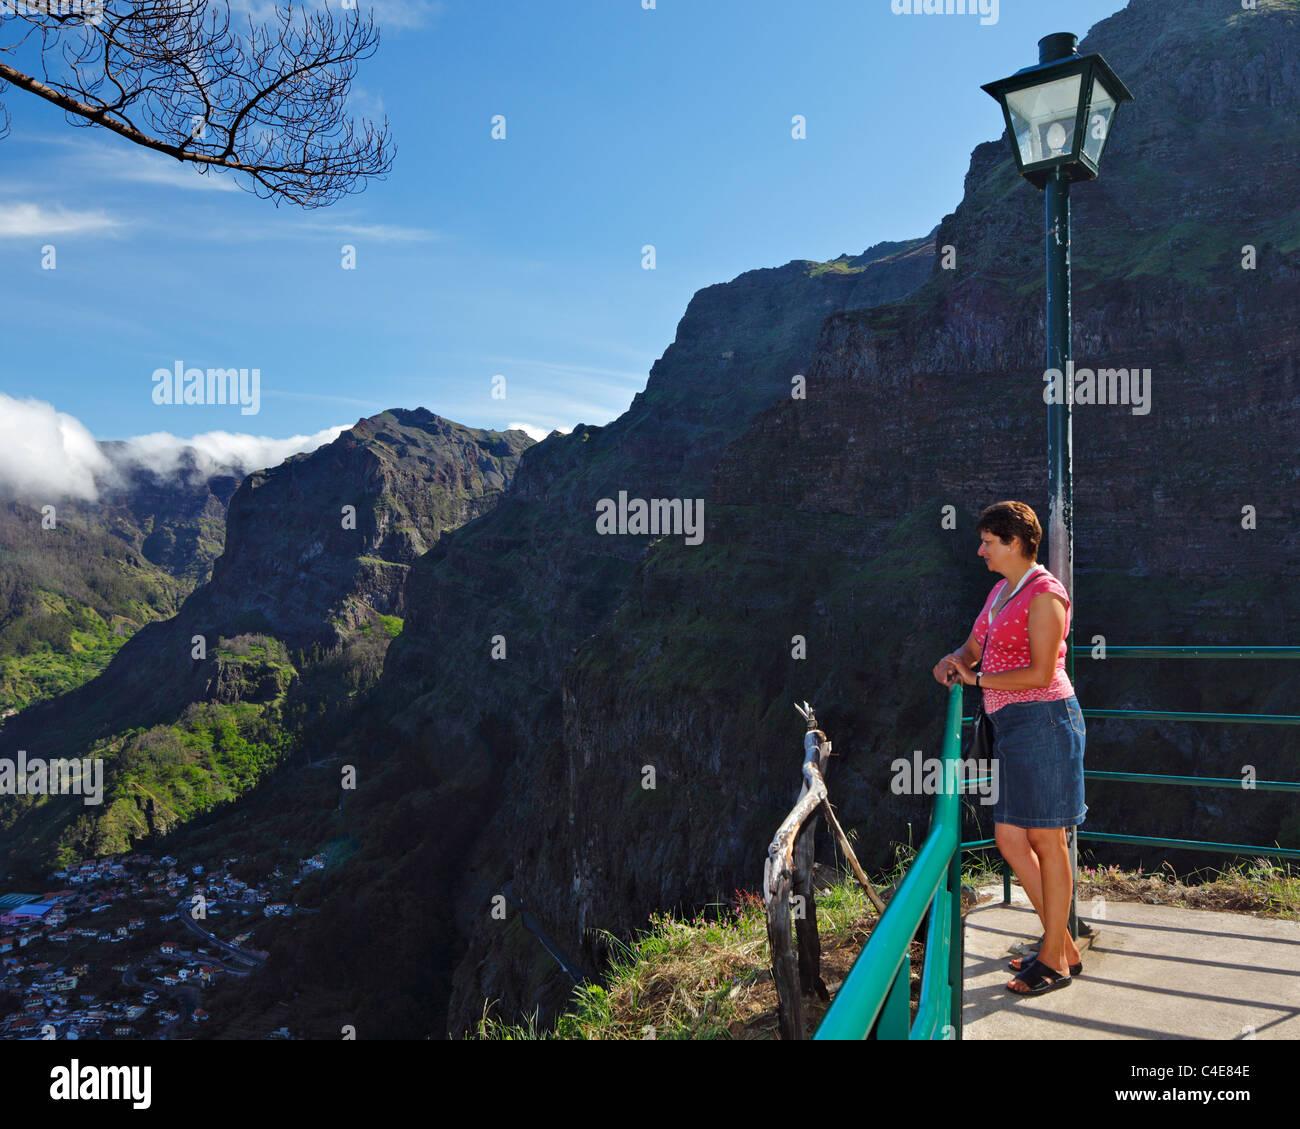 Woman looking at the Village of Curral das Freiras from Eira do Serrado, Madeira. - Stock Image